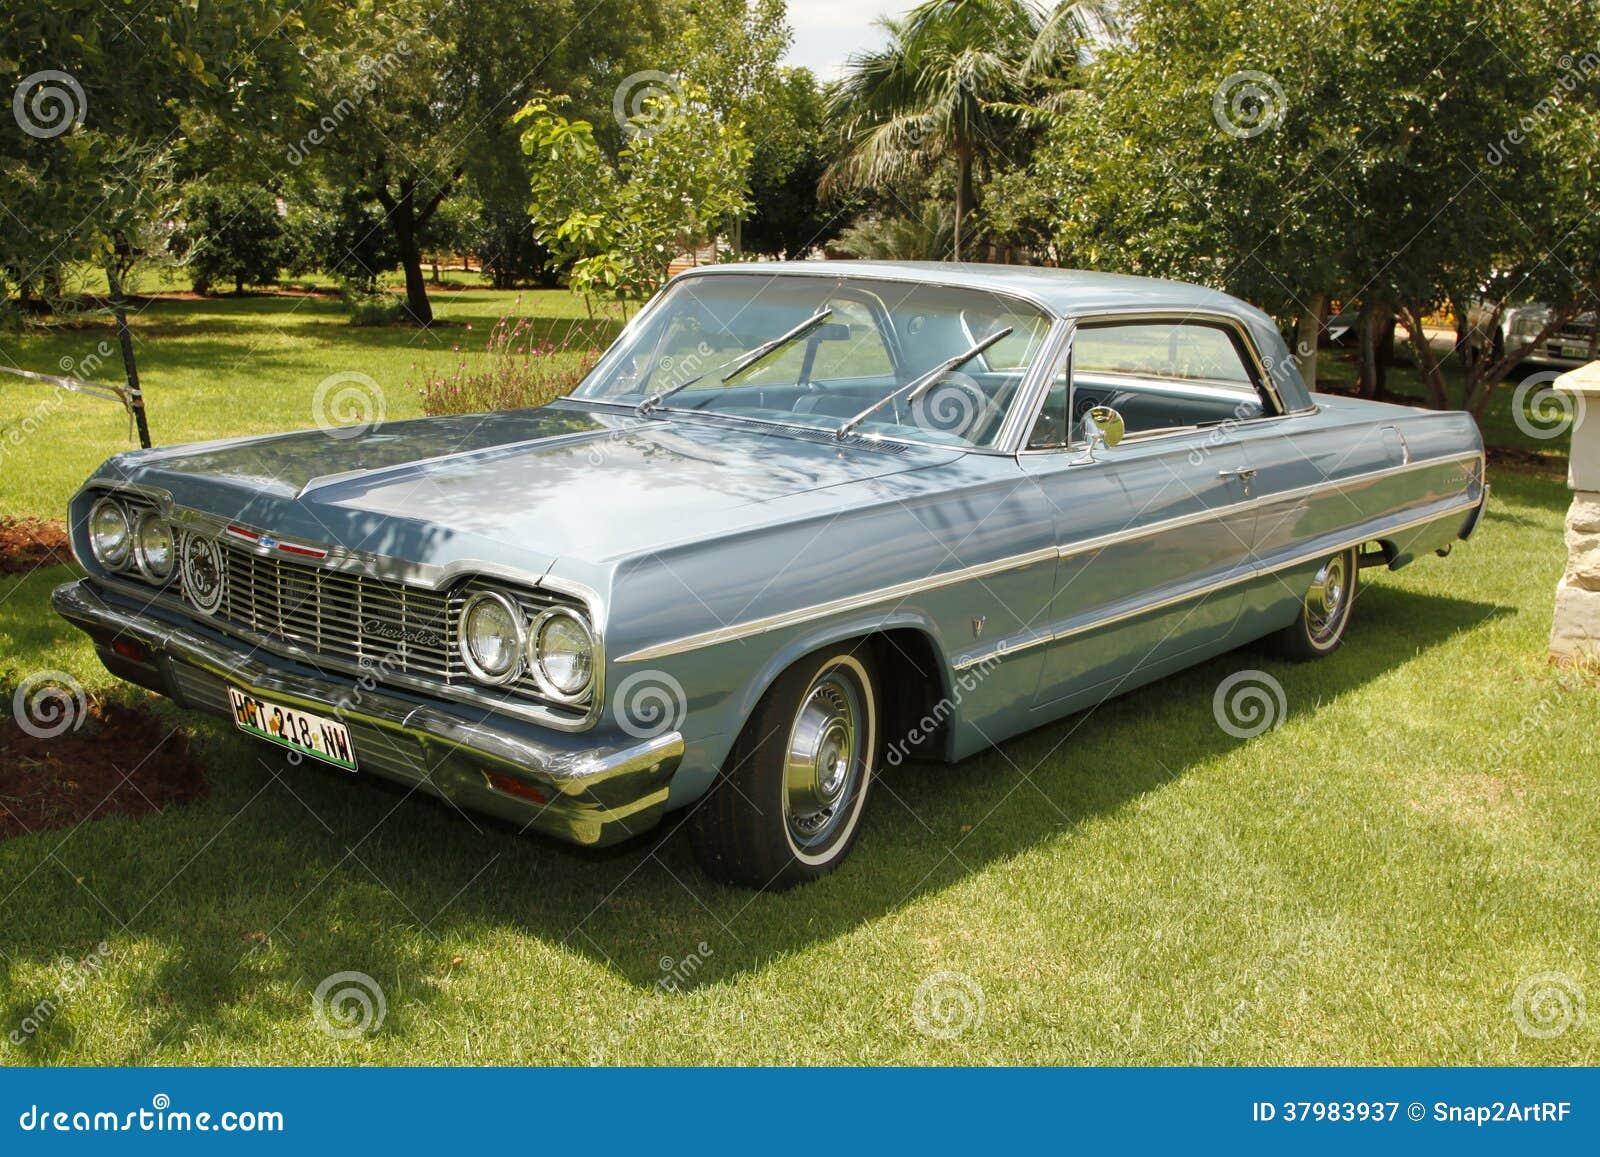 Vintage Car 1964 Chevrolet Impala Coupe Editorial ...